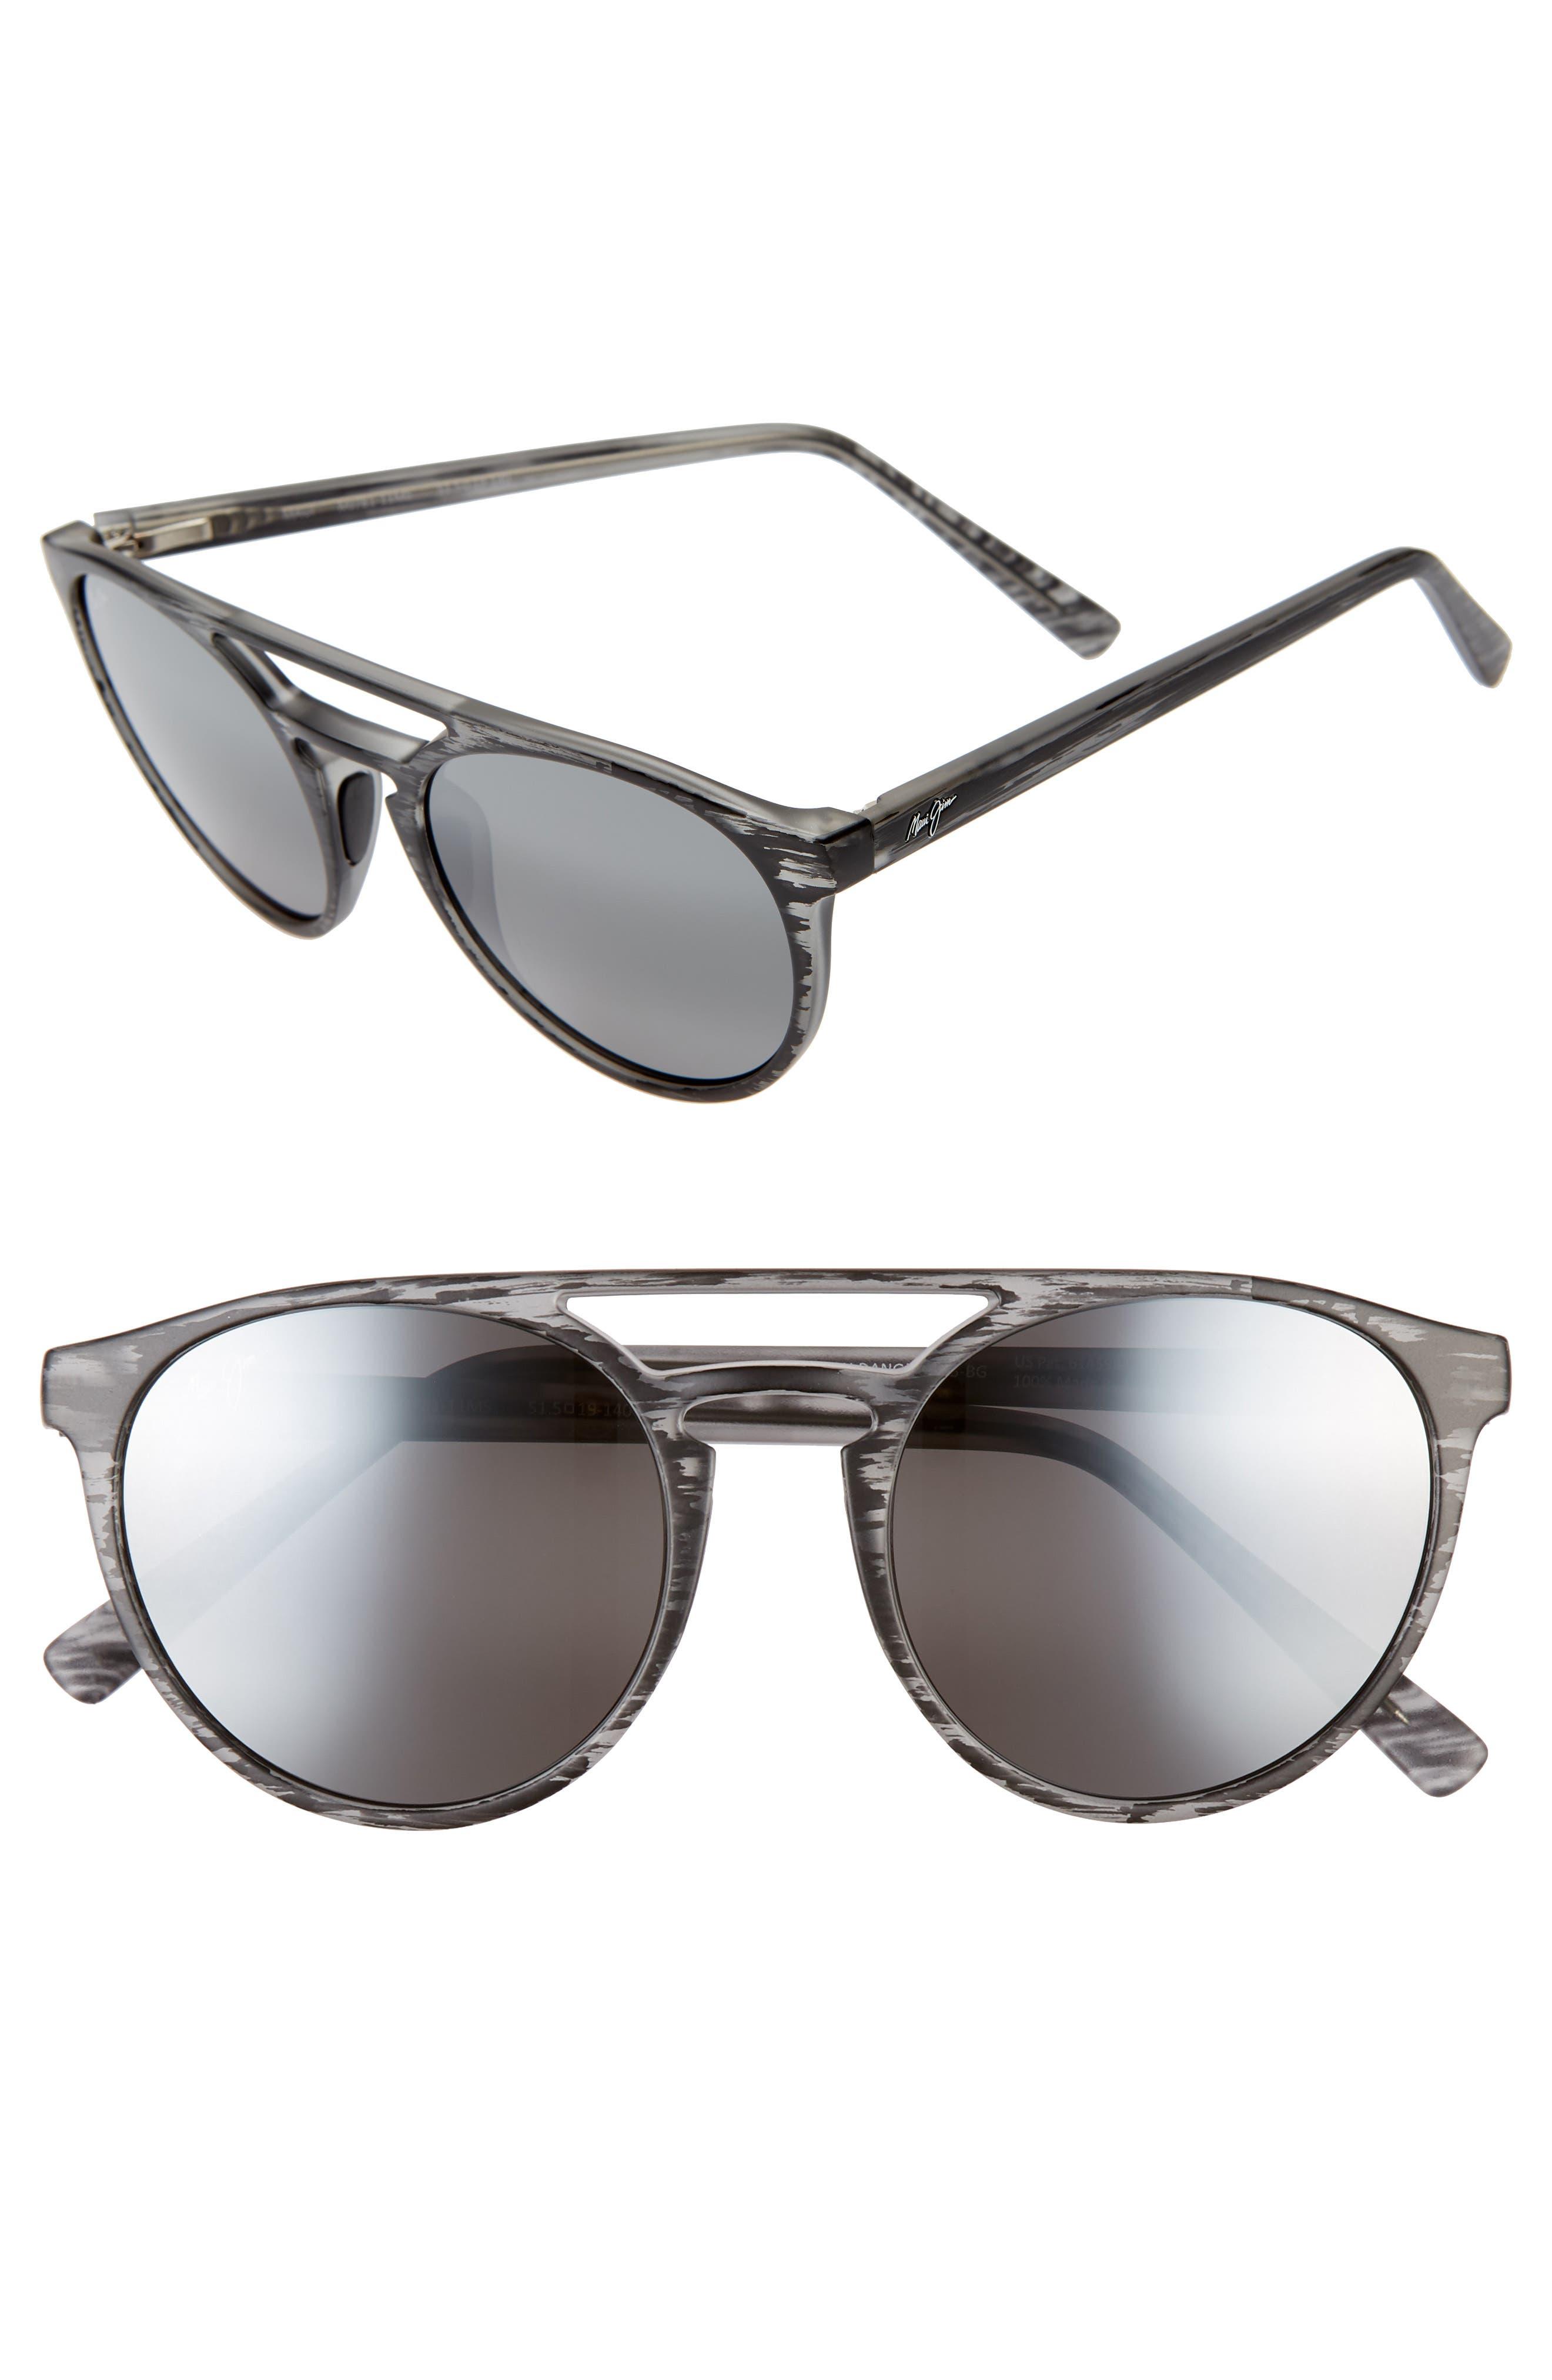 Maui Jim Ah Dang! 52Mm Polarizedplus2 Flat Top Sunglasses - Grey Stripe/ Neutral Grey